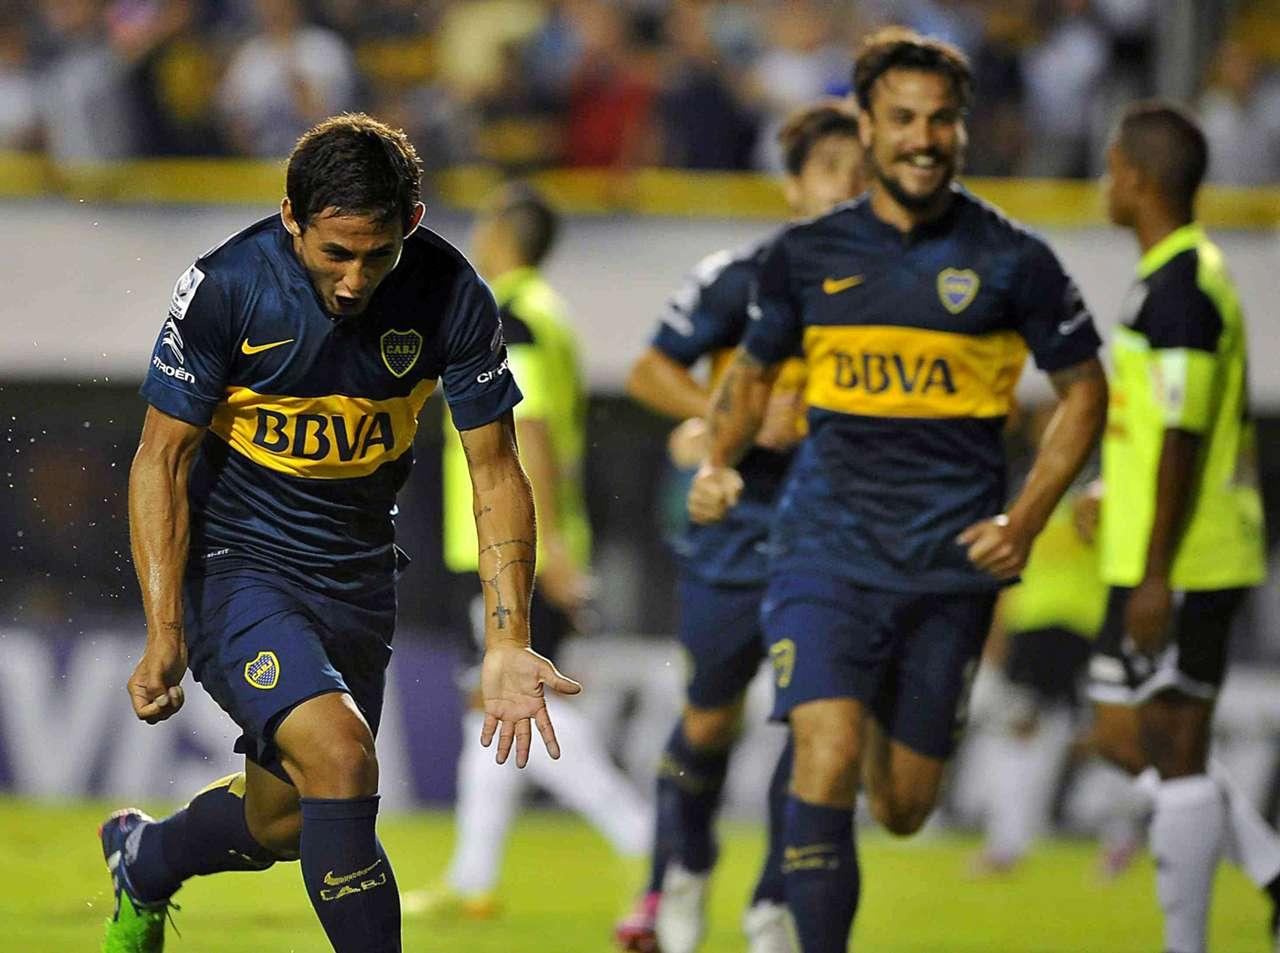 Boca Juniors - Zamora 11032015